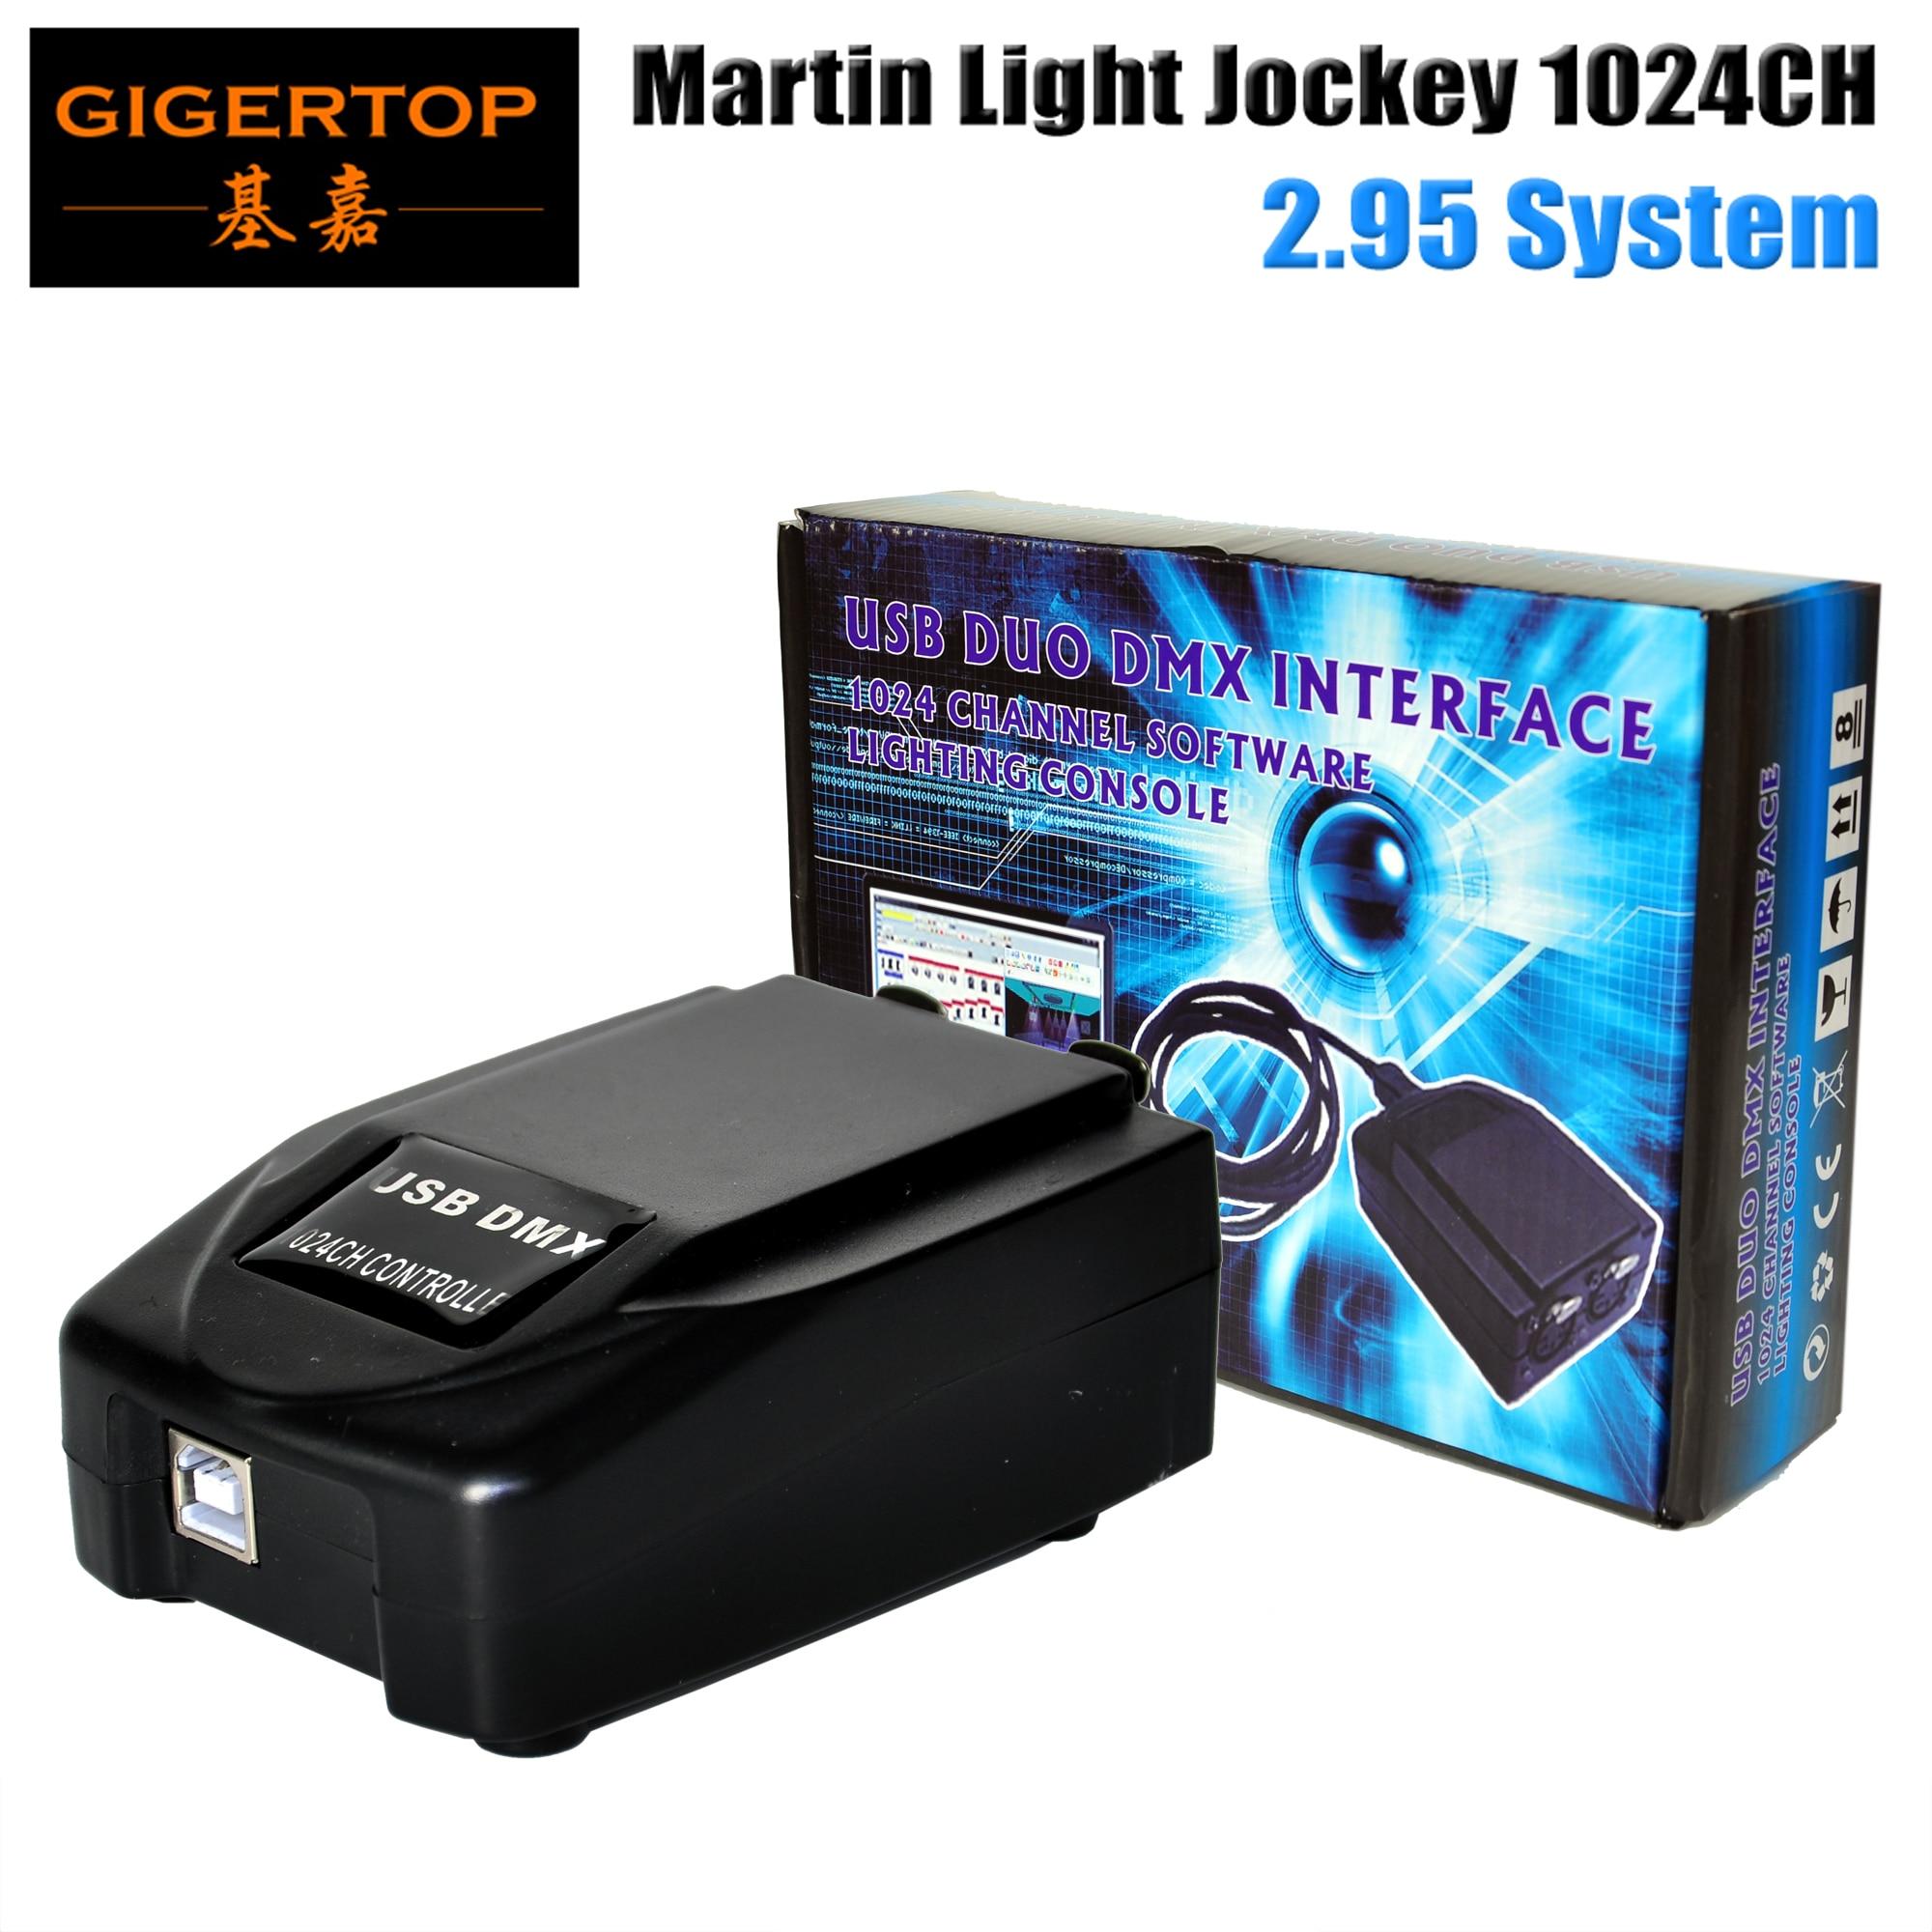 Free Shipping Martin Light Jockey 1024 USB Controller PC Windows based Controller Utilizing USB DMX Interface Led Stage Light|usb 2.0 pc card|usb controlled power switch|usb manual - title=